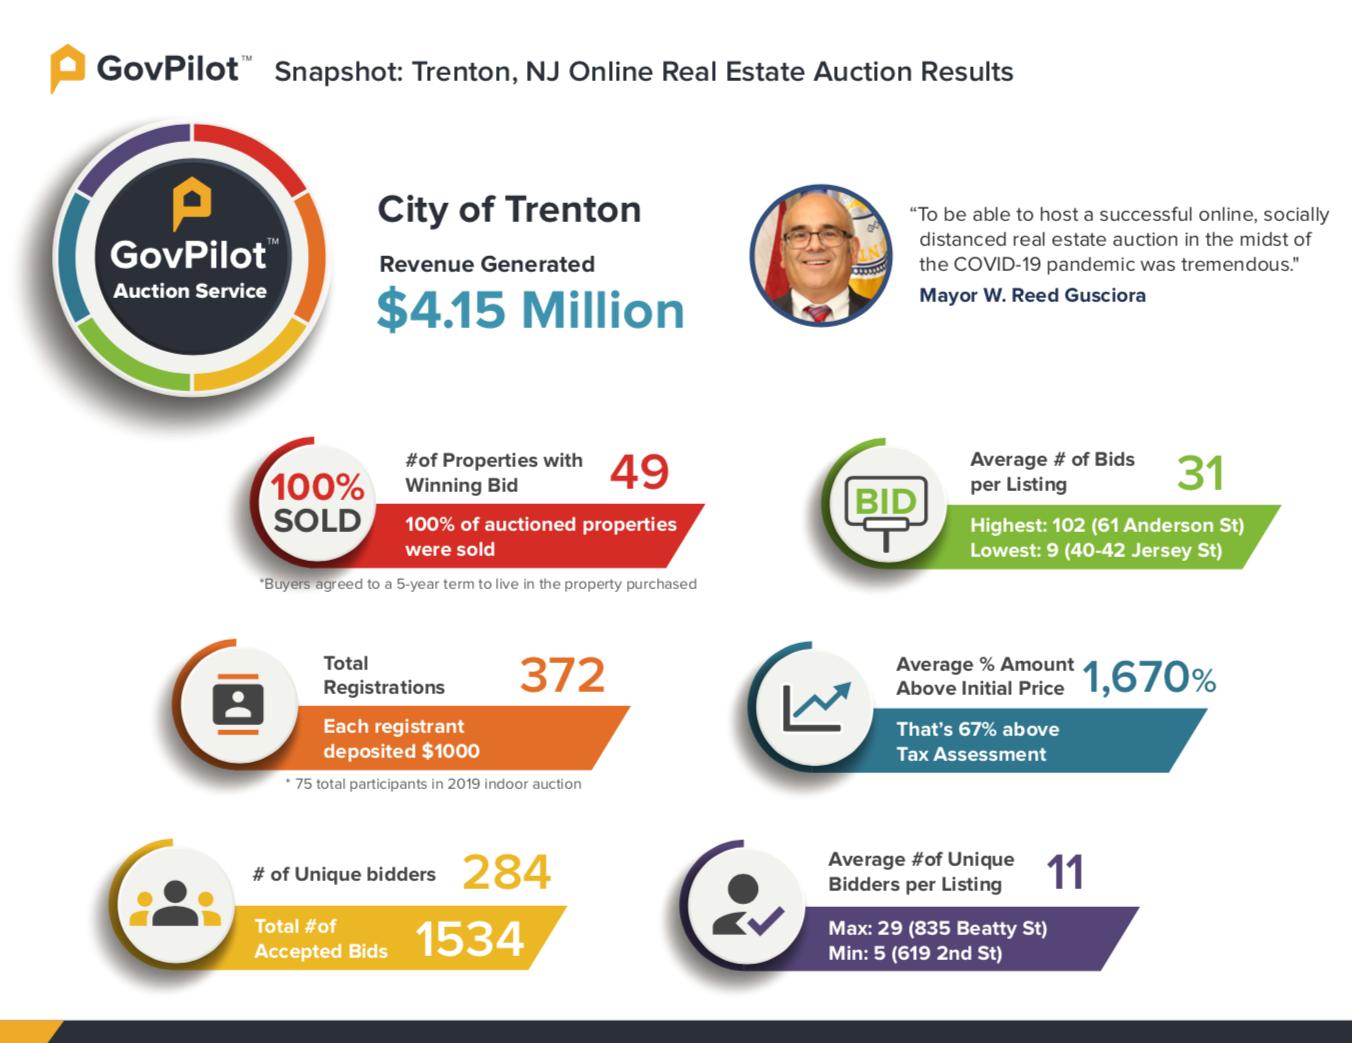 GovPilot Trenton real estate auction